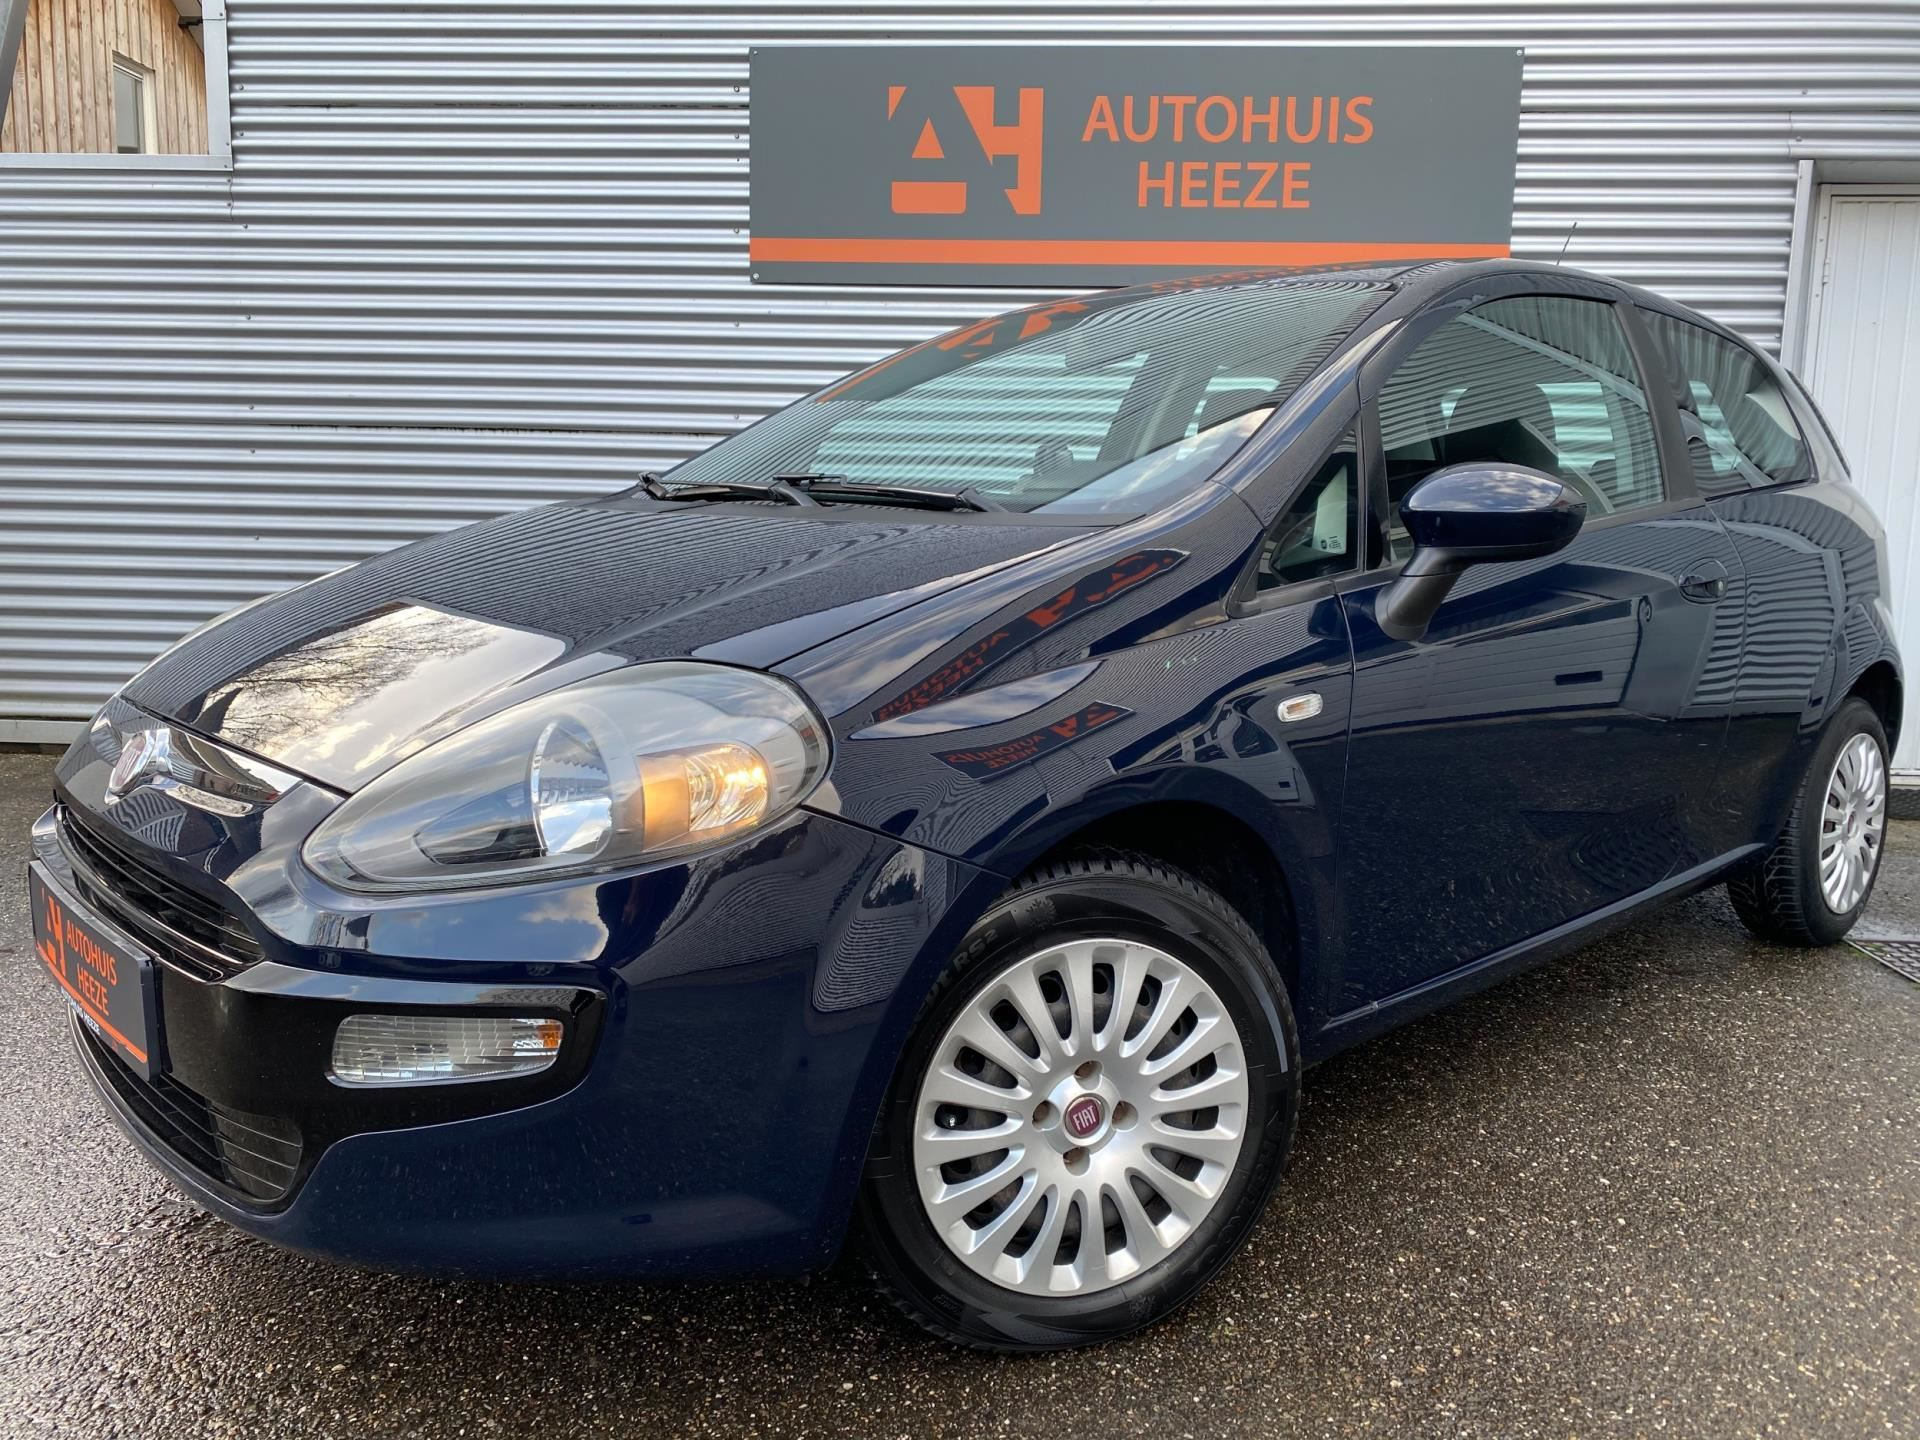 Fiat Punto Evo occasion - Autohuis Heeze